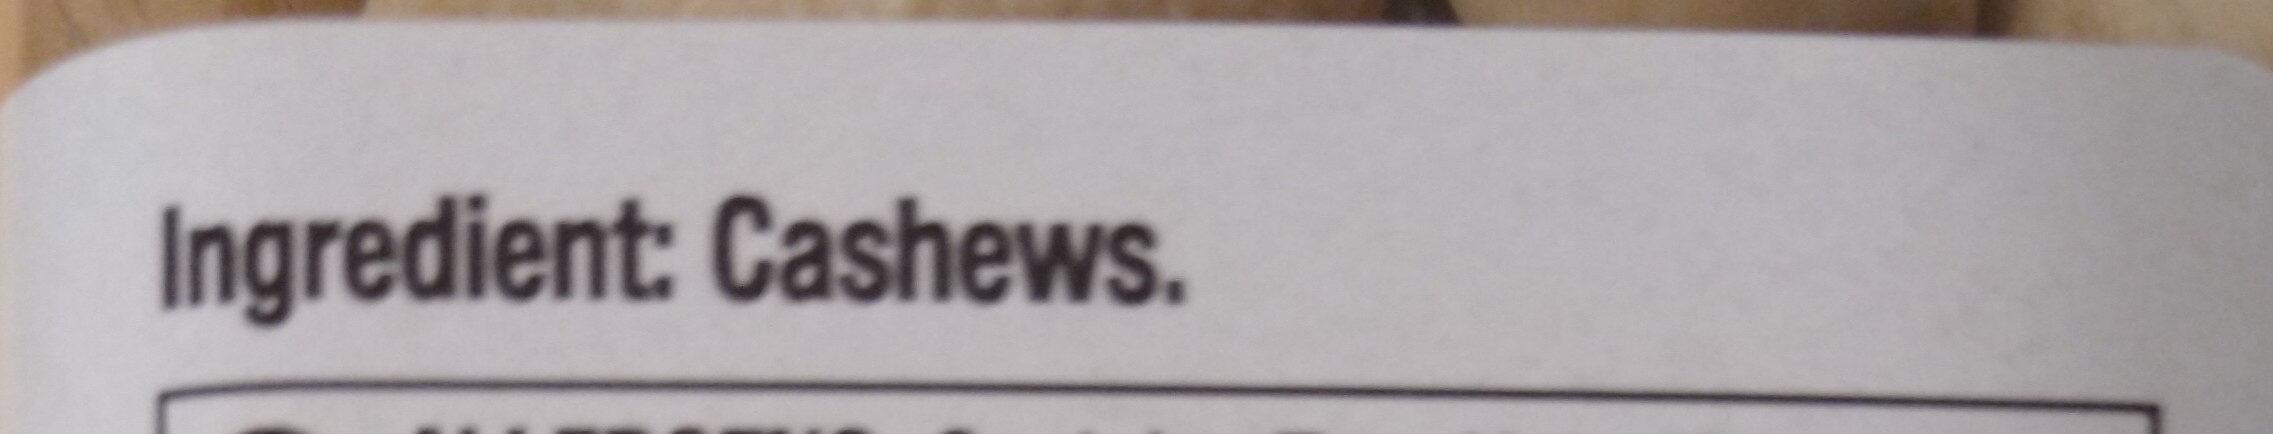 Raw Whole Cashews - Ingredienti - en